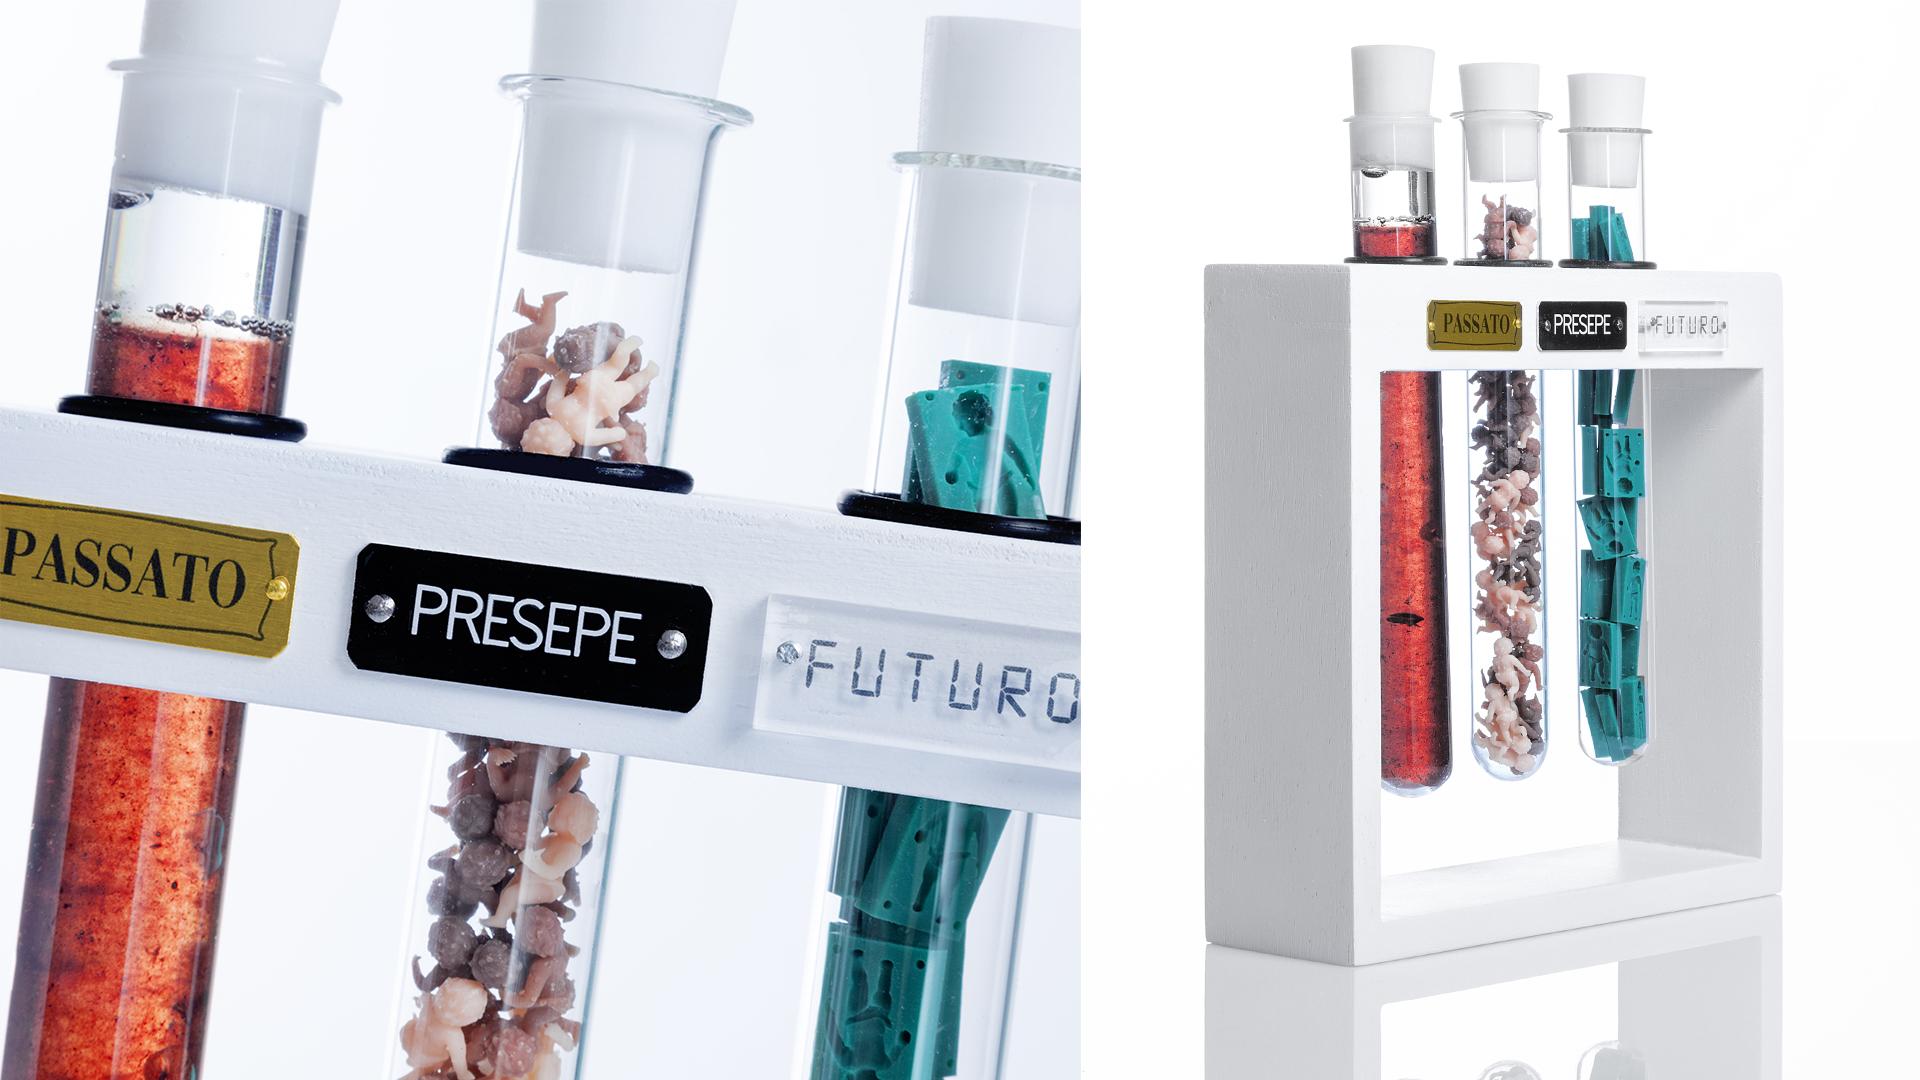 UNiVERSO – passato / presepe / passato-wood, resin, human blood, glass, brass, aluminum, plexiglas-21cm x 21cm x 5cm-©2018 – Edition of 1